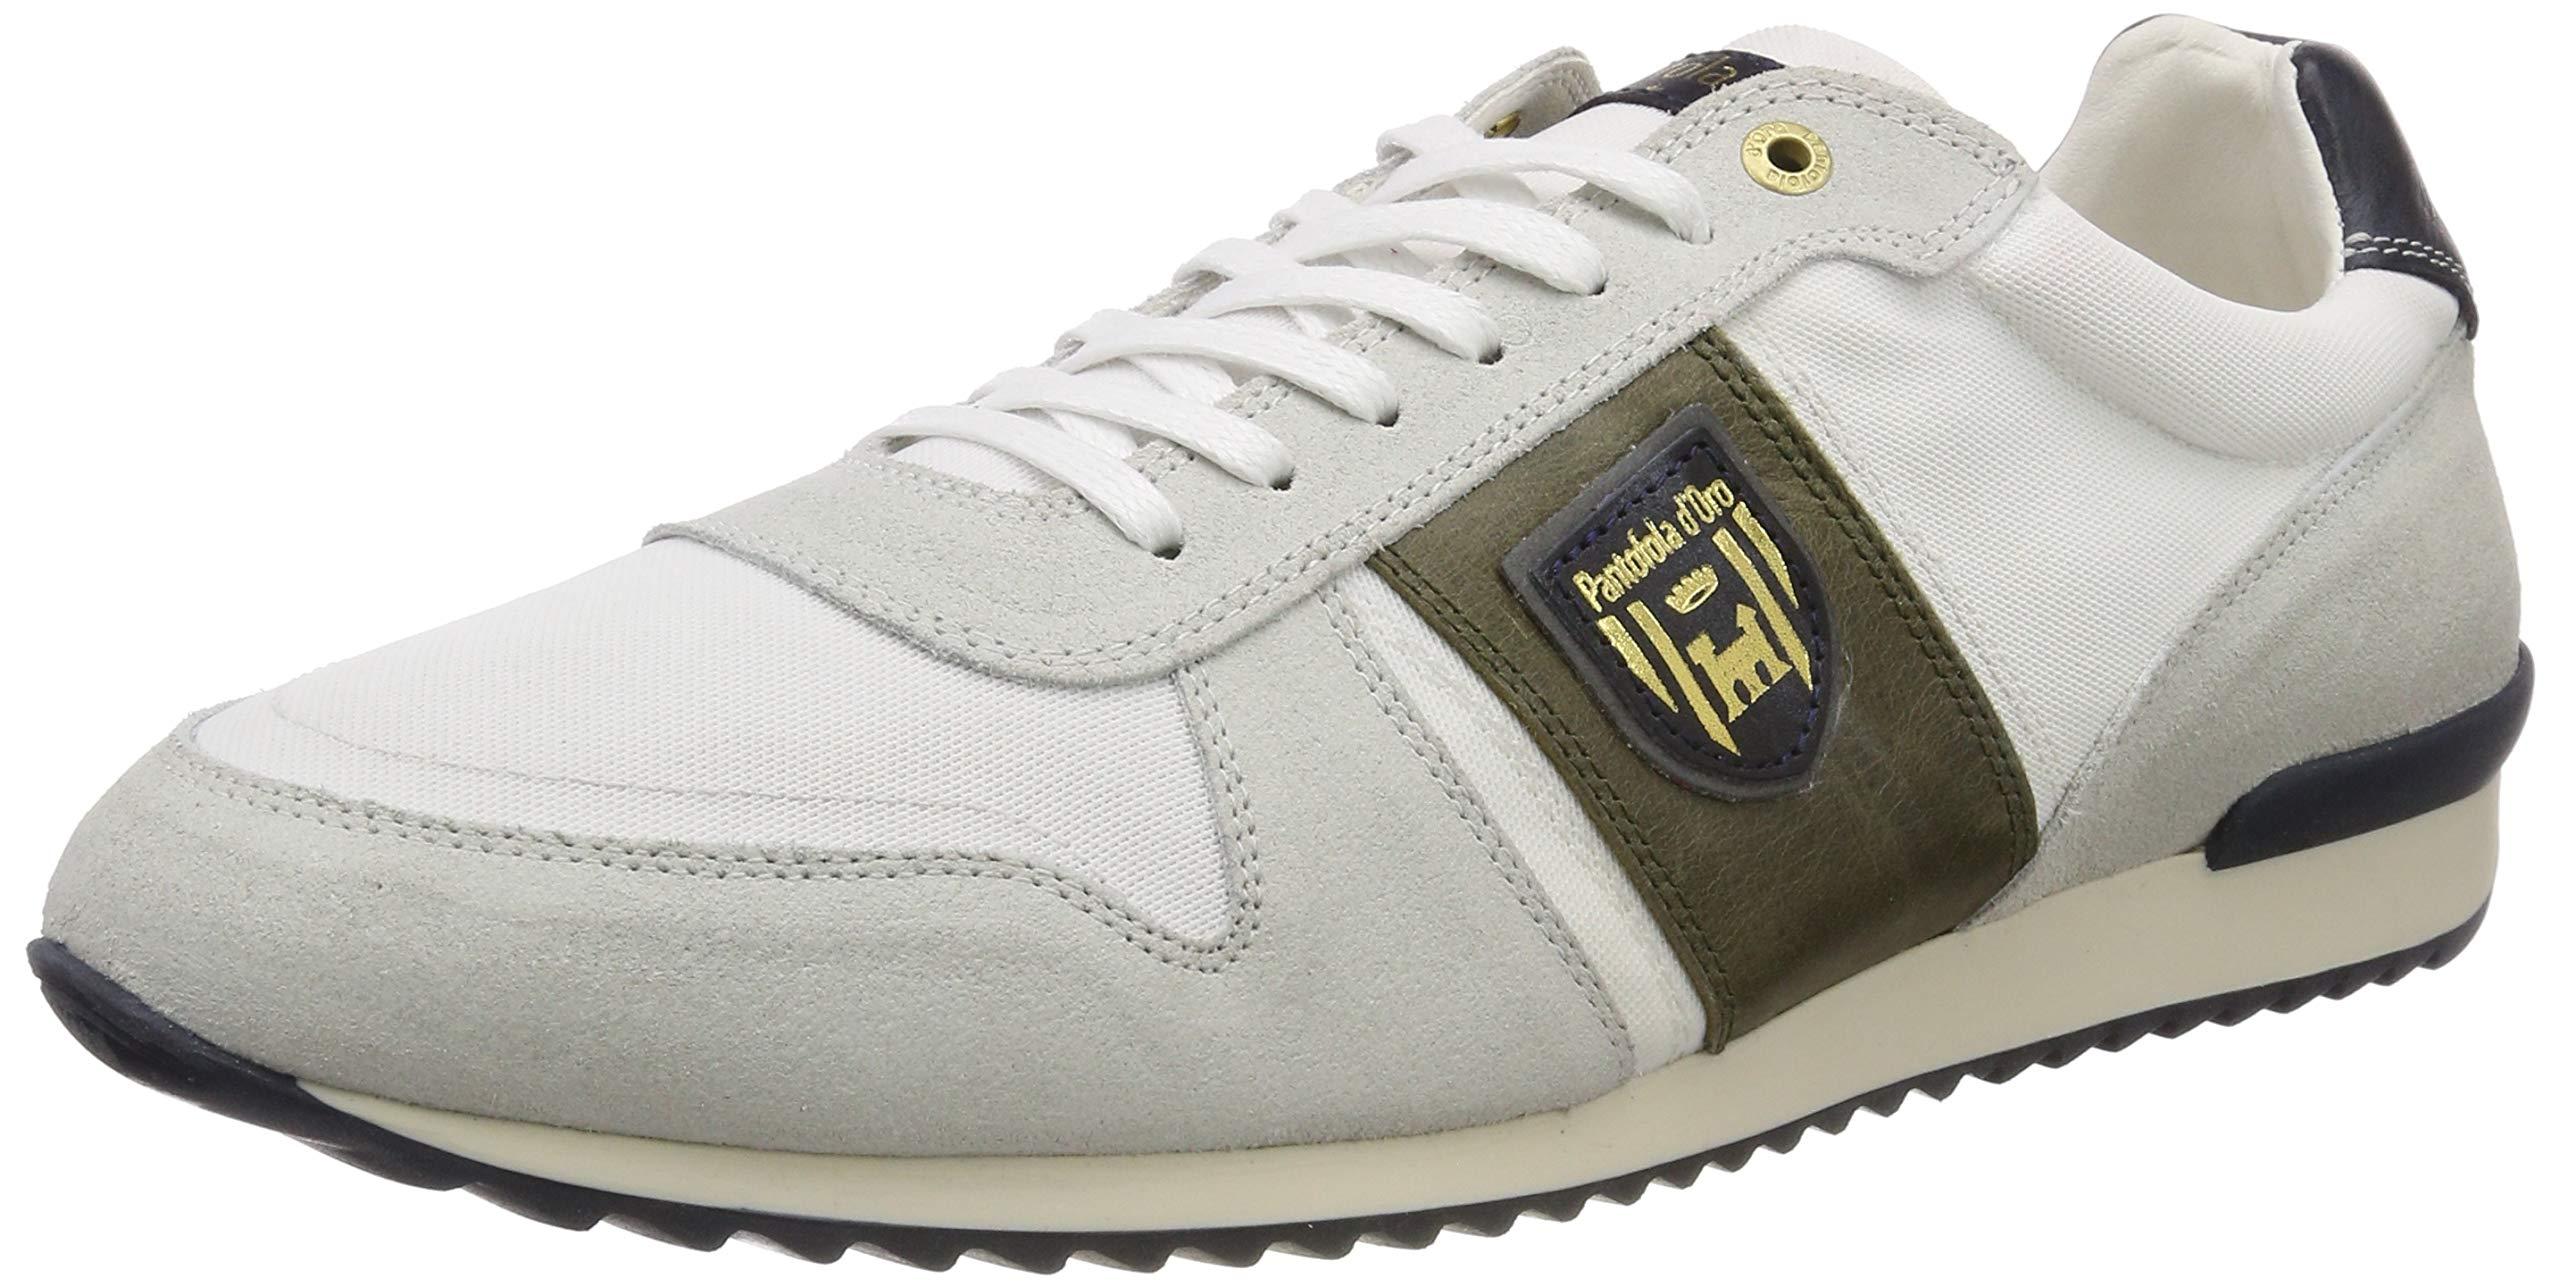 HommeBlancbright Nb Umito Uomo LowSneakers Eu White1fg44 D'oro Pantofola Basses q3jRLc4S5A